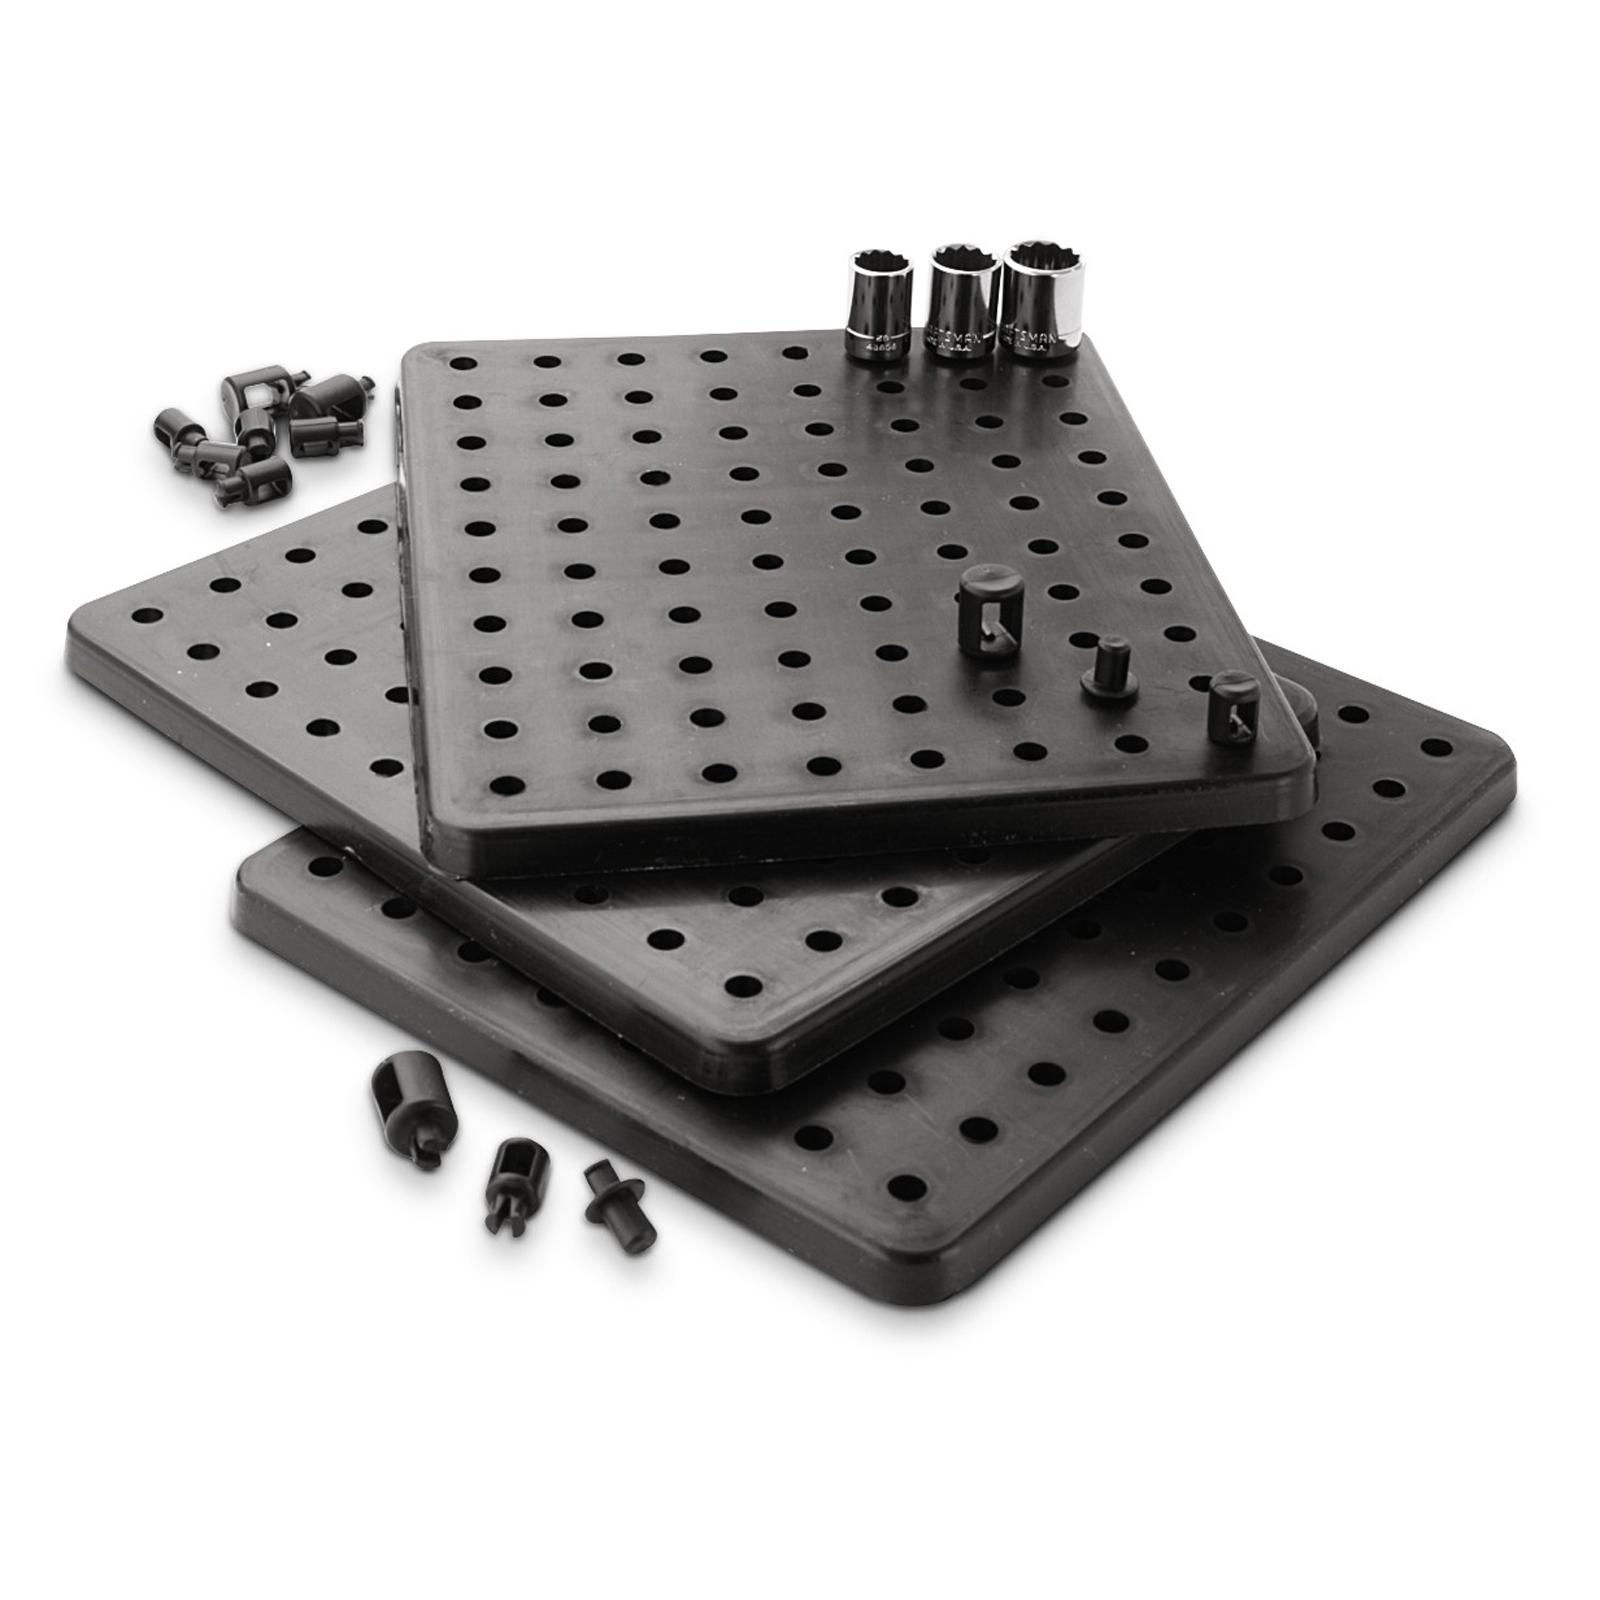 Craftsman 103 pc. Socket Tray Set